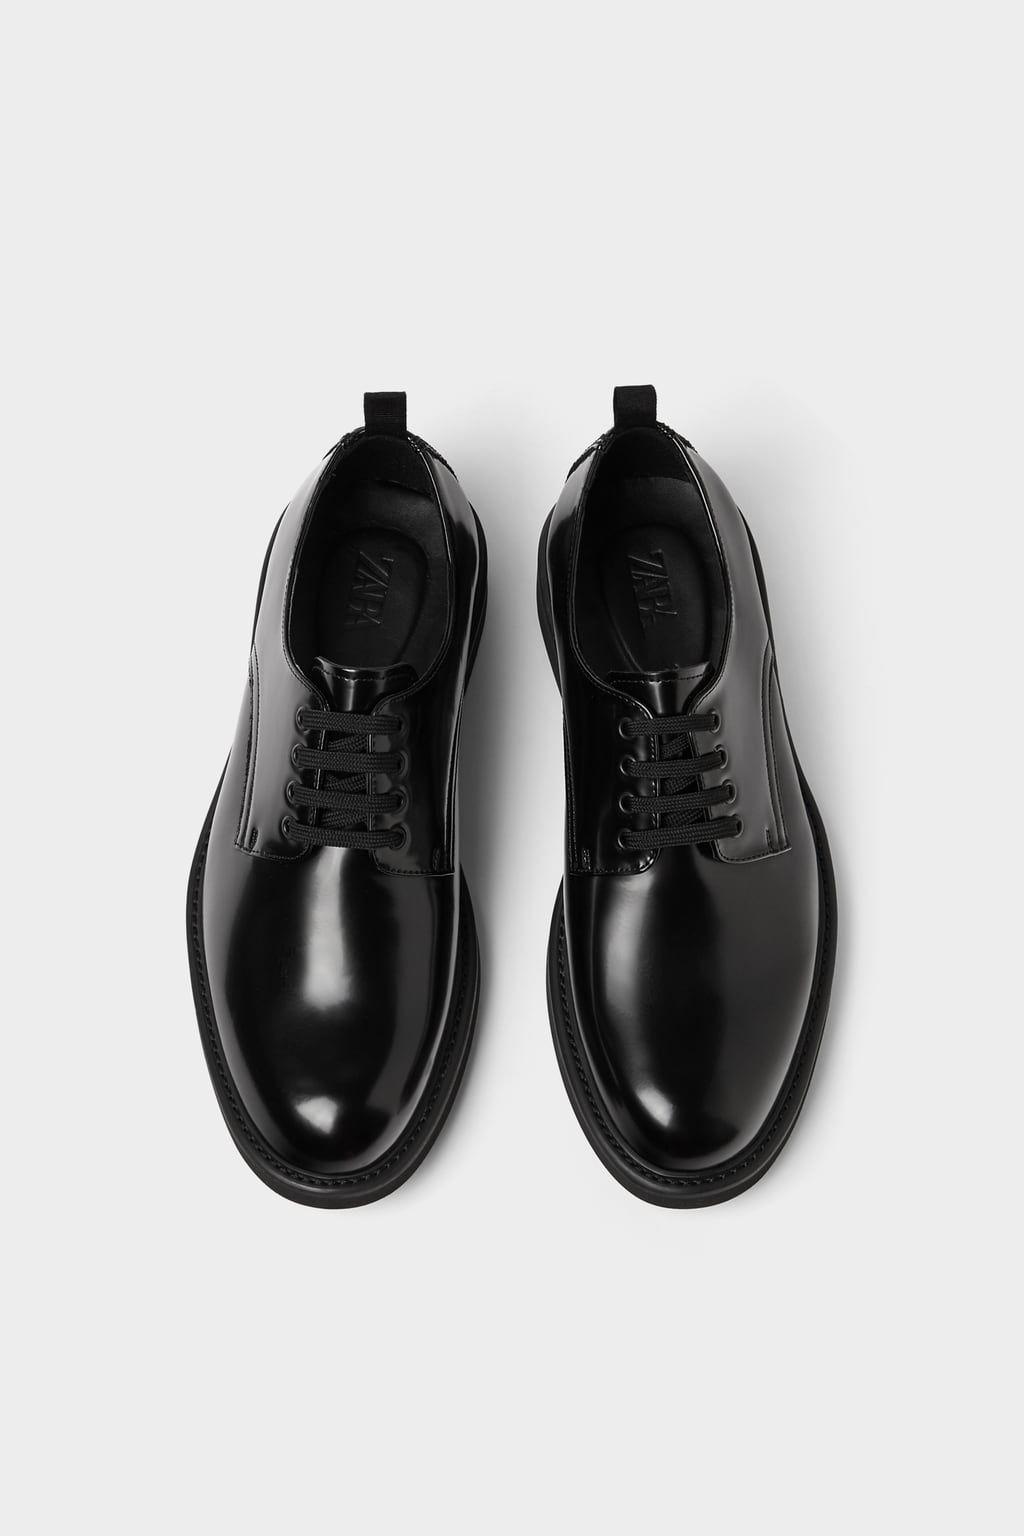 Black Shoes Zara Light View All Shoes Man Zara Indonesia Gentleman Shoes Mens Black Dress Shoes Dress Shoes Men [ 1536 x 1024 Pixel ]